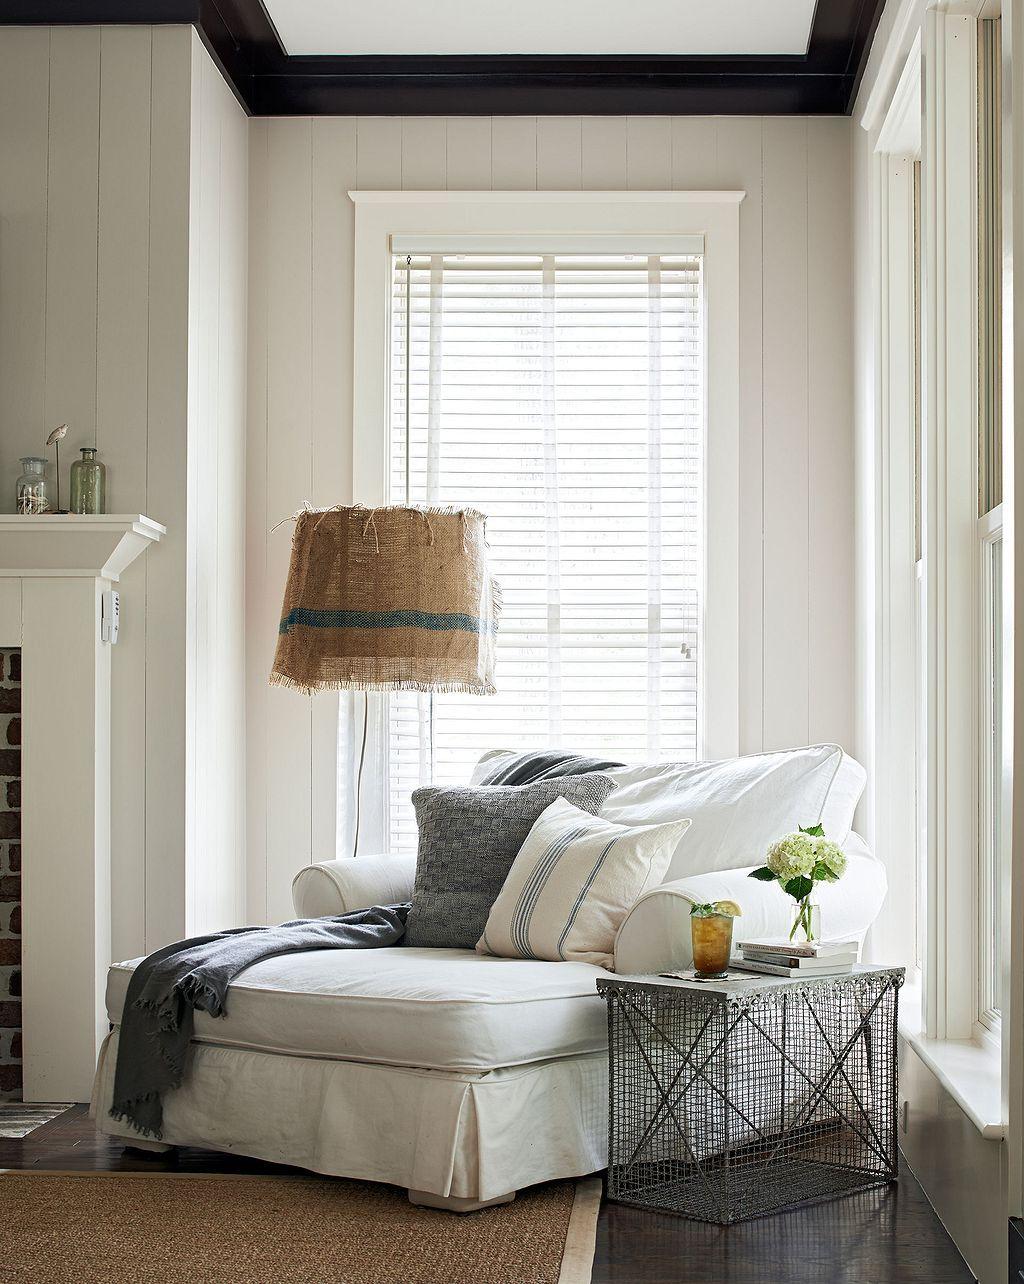 80 Reading Corner Ideas In Master Bedroom Farm house